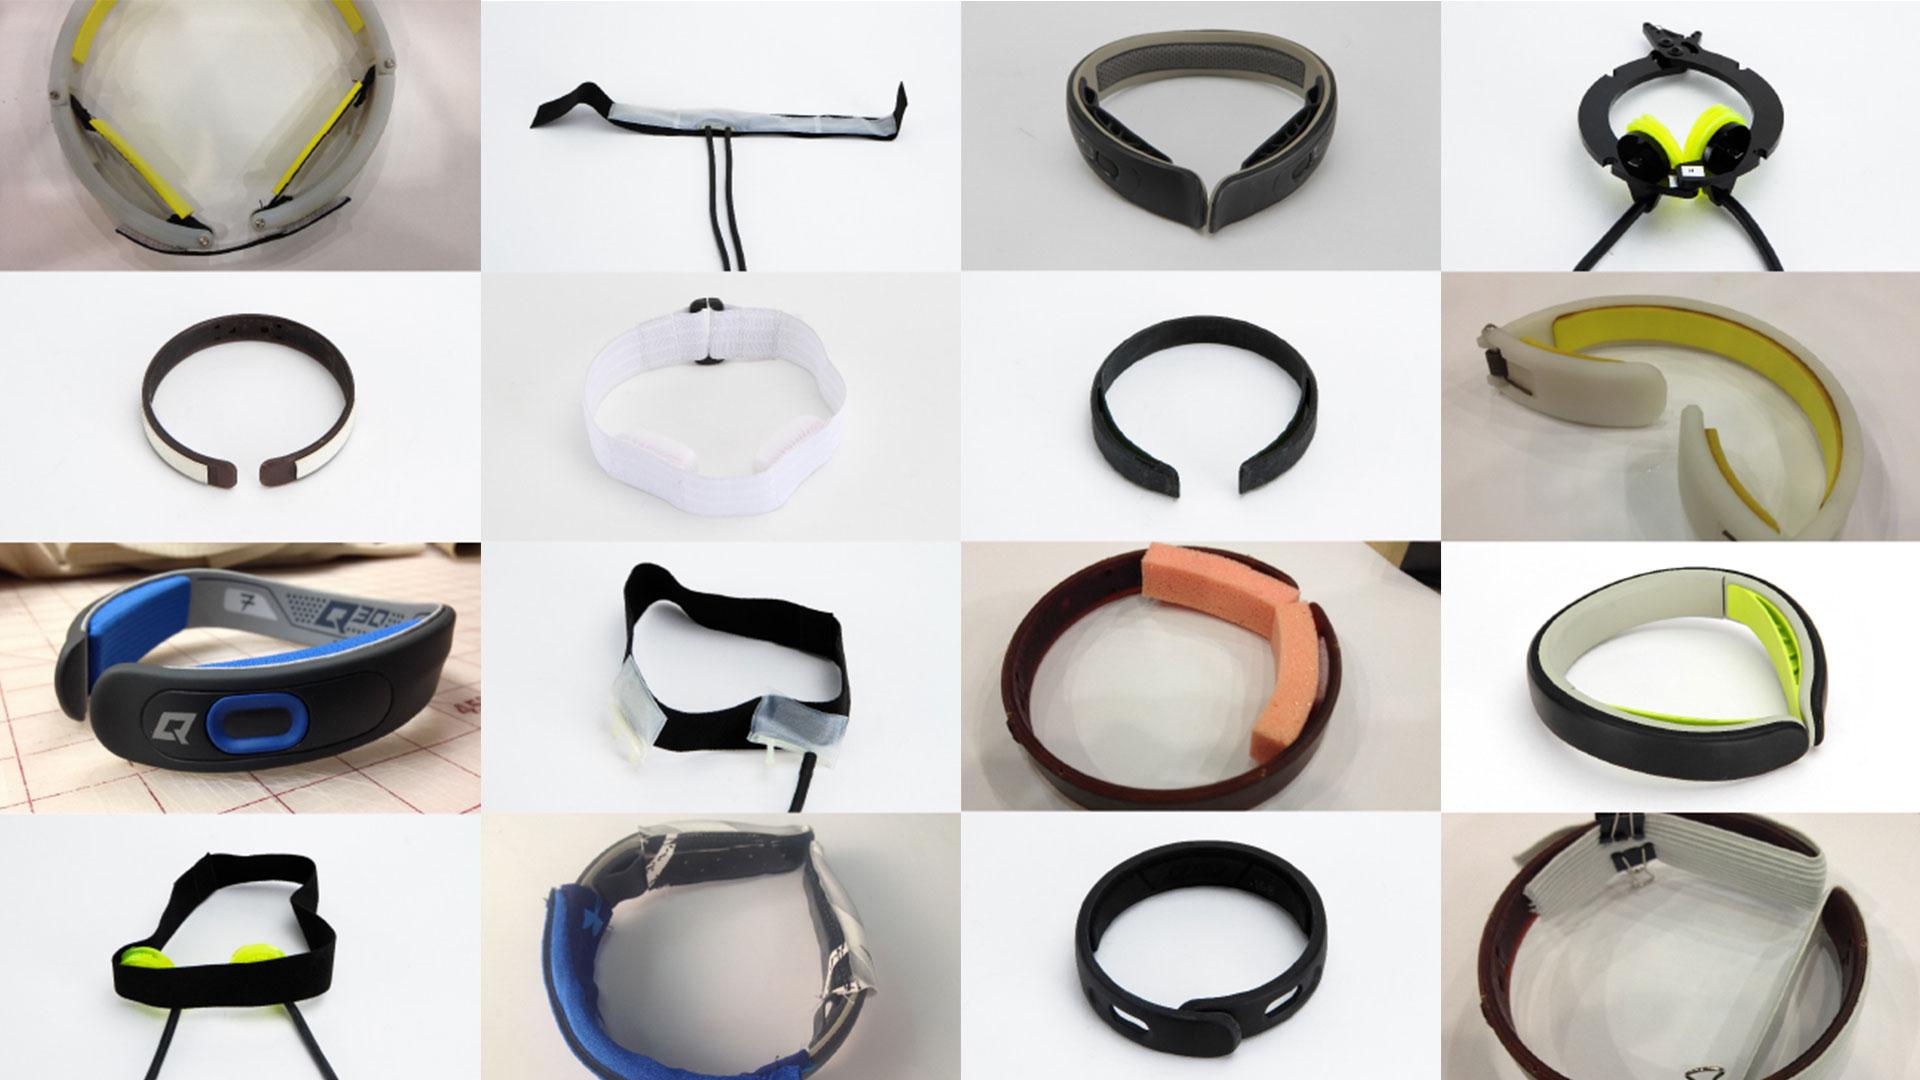 prioritydesigns_concussion_collar_prototype_development